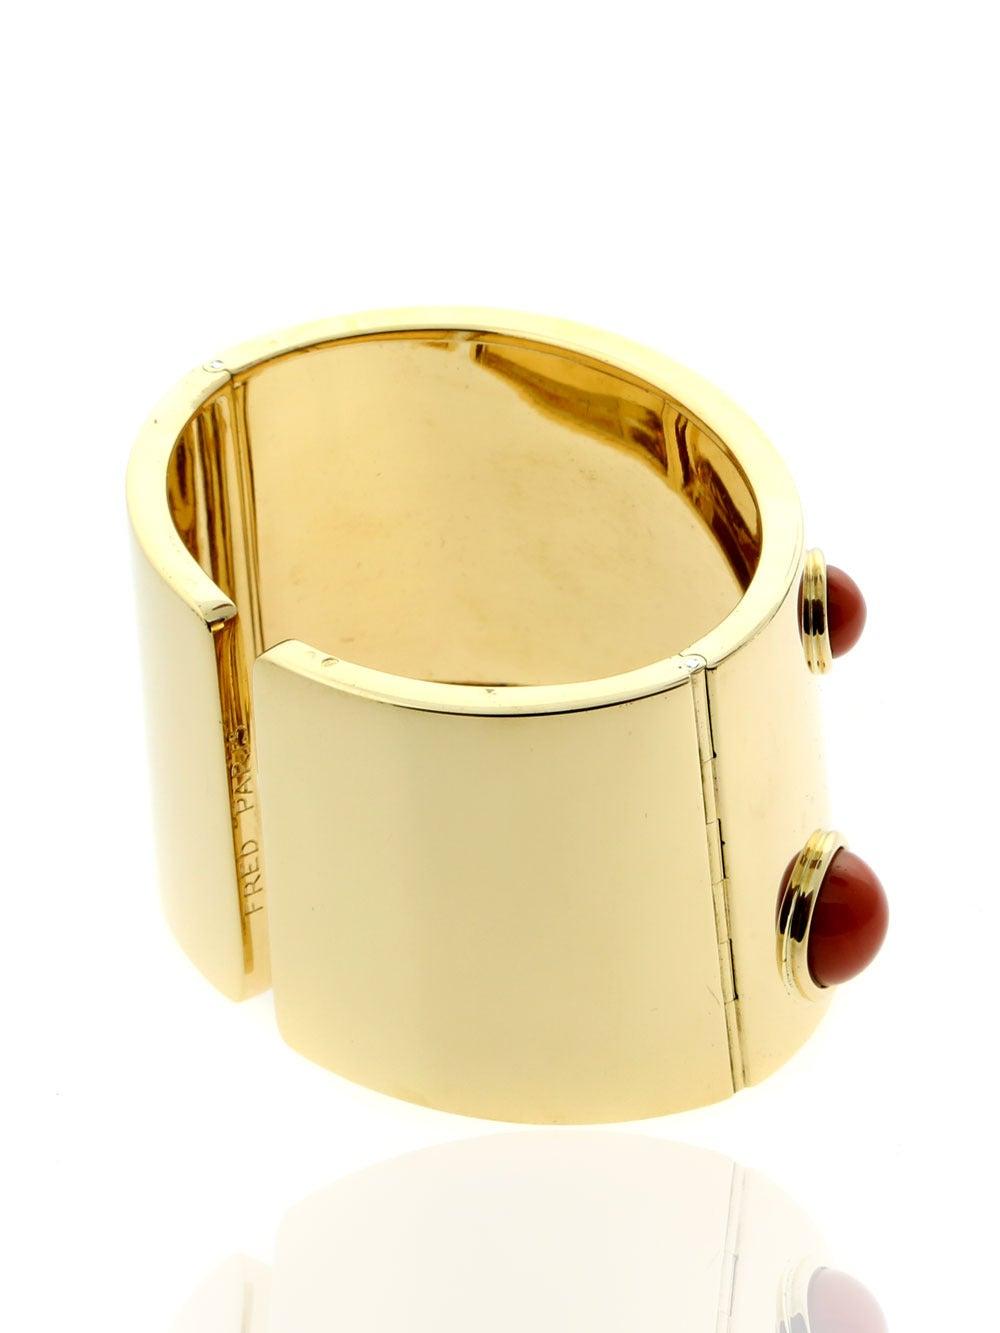 Fred of Paris Coral Gold Arm Cuff Bracelet  4